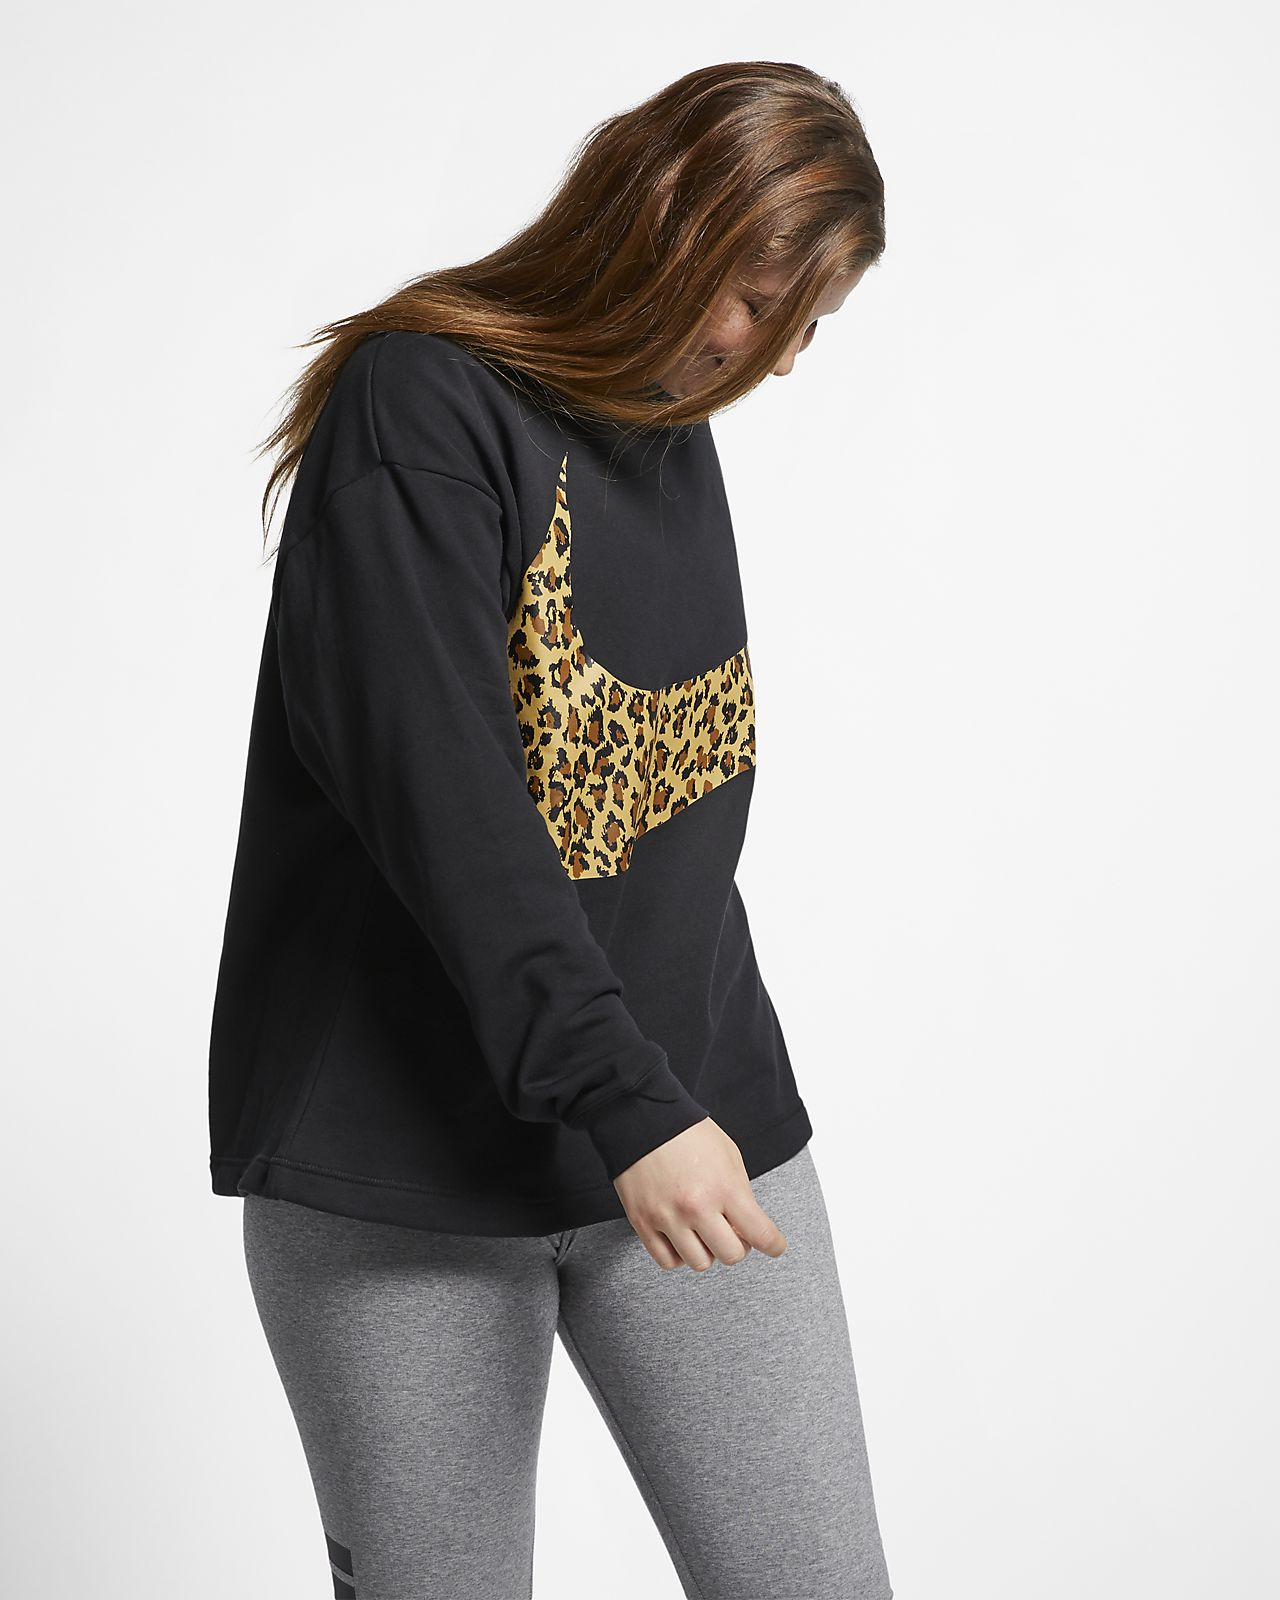 Redondo Nike Cuello Sportswear Grande Mujertalla Animalier Suéter qGUpVjSzML